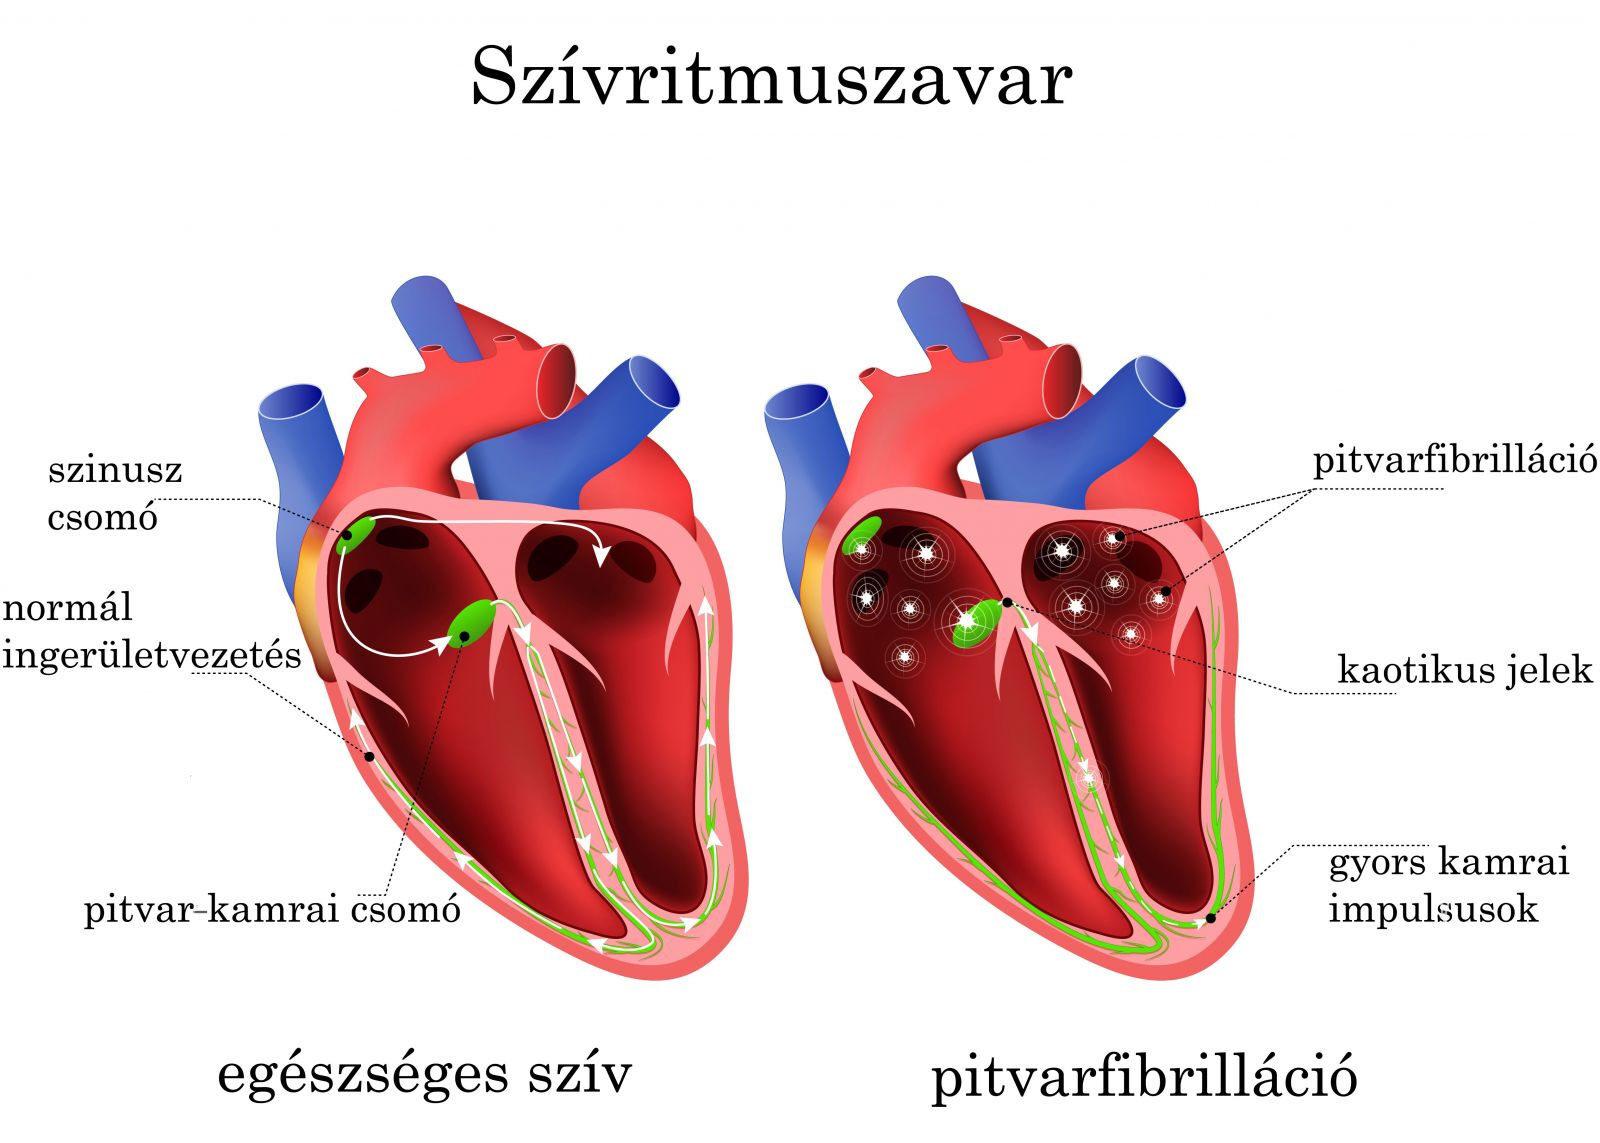 Szapora szívverés, magas pulzus